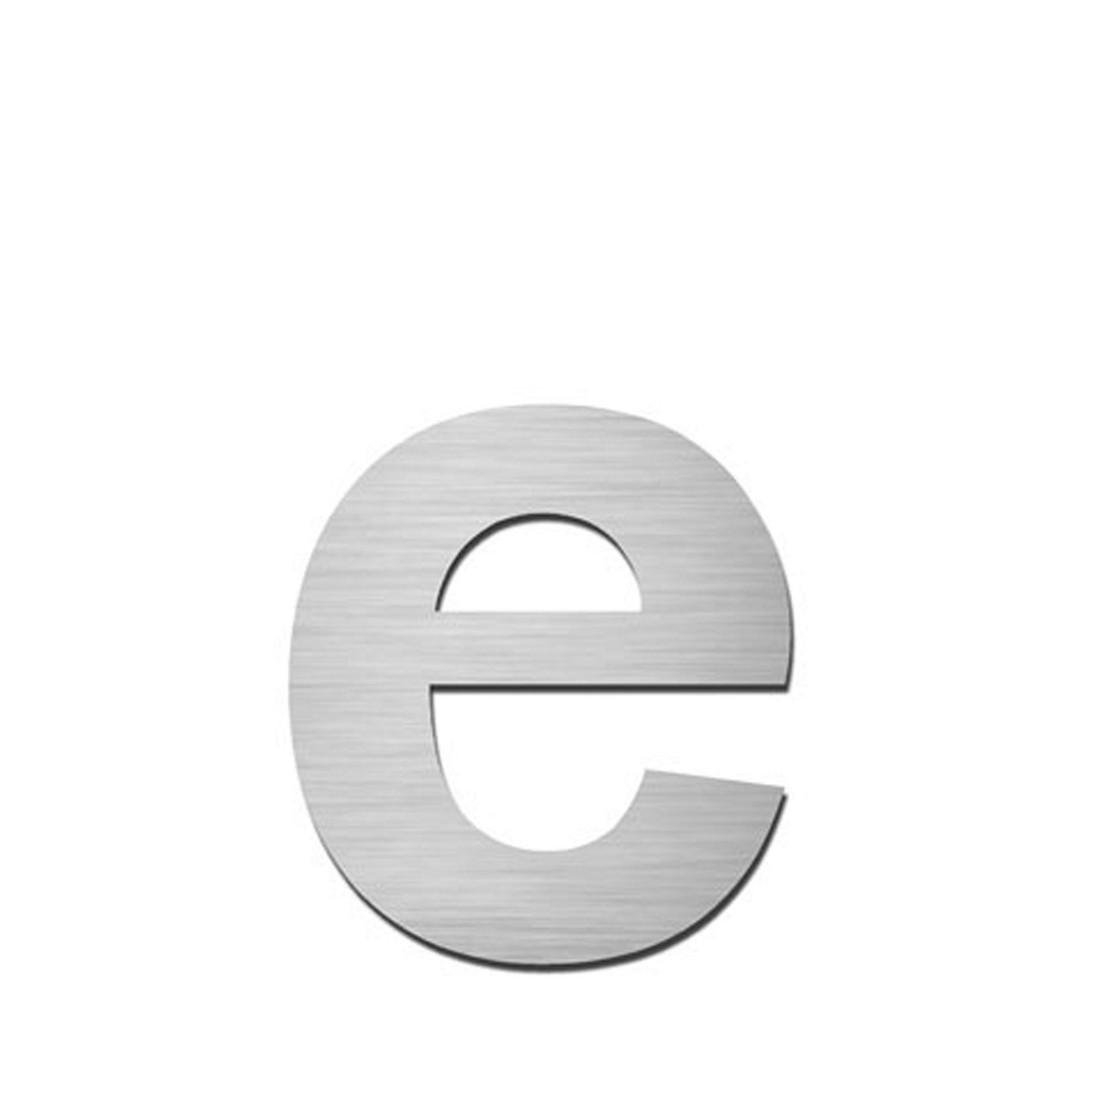 Hausnummer Index zum Aufkleben e - Matt Gebürstet Edelstahl Silber, Serafini